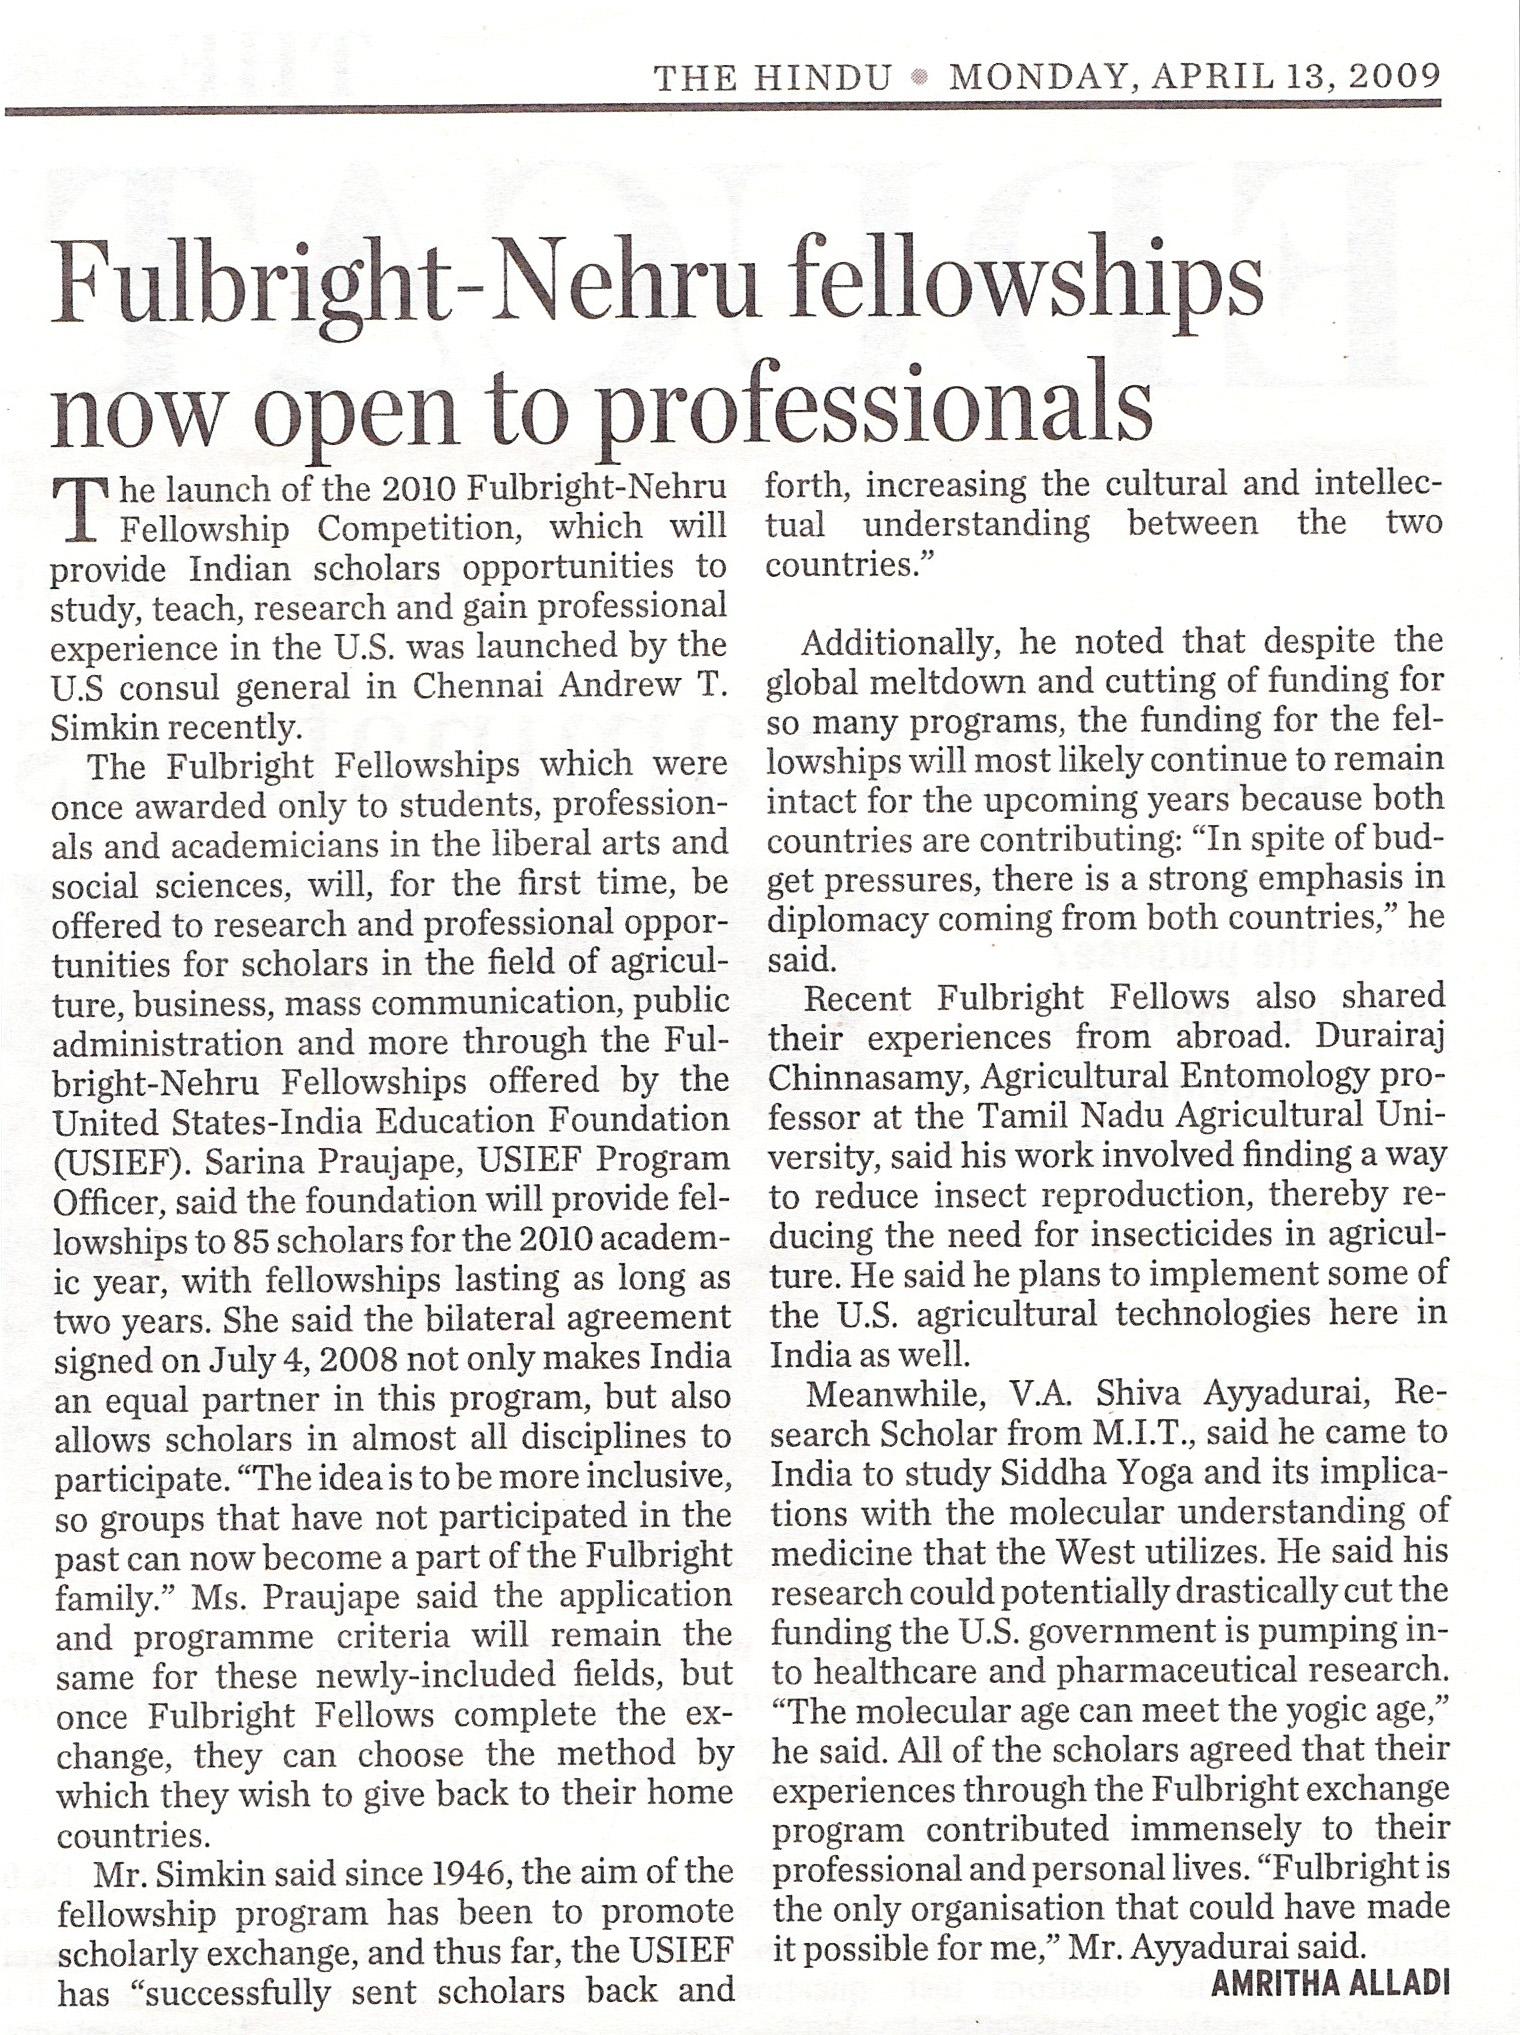 Fulbright-Nehru